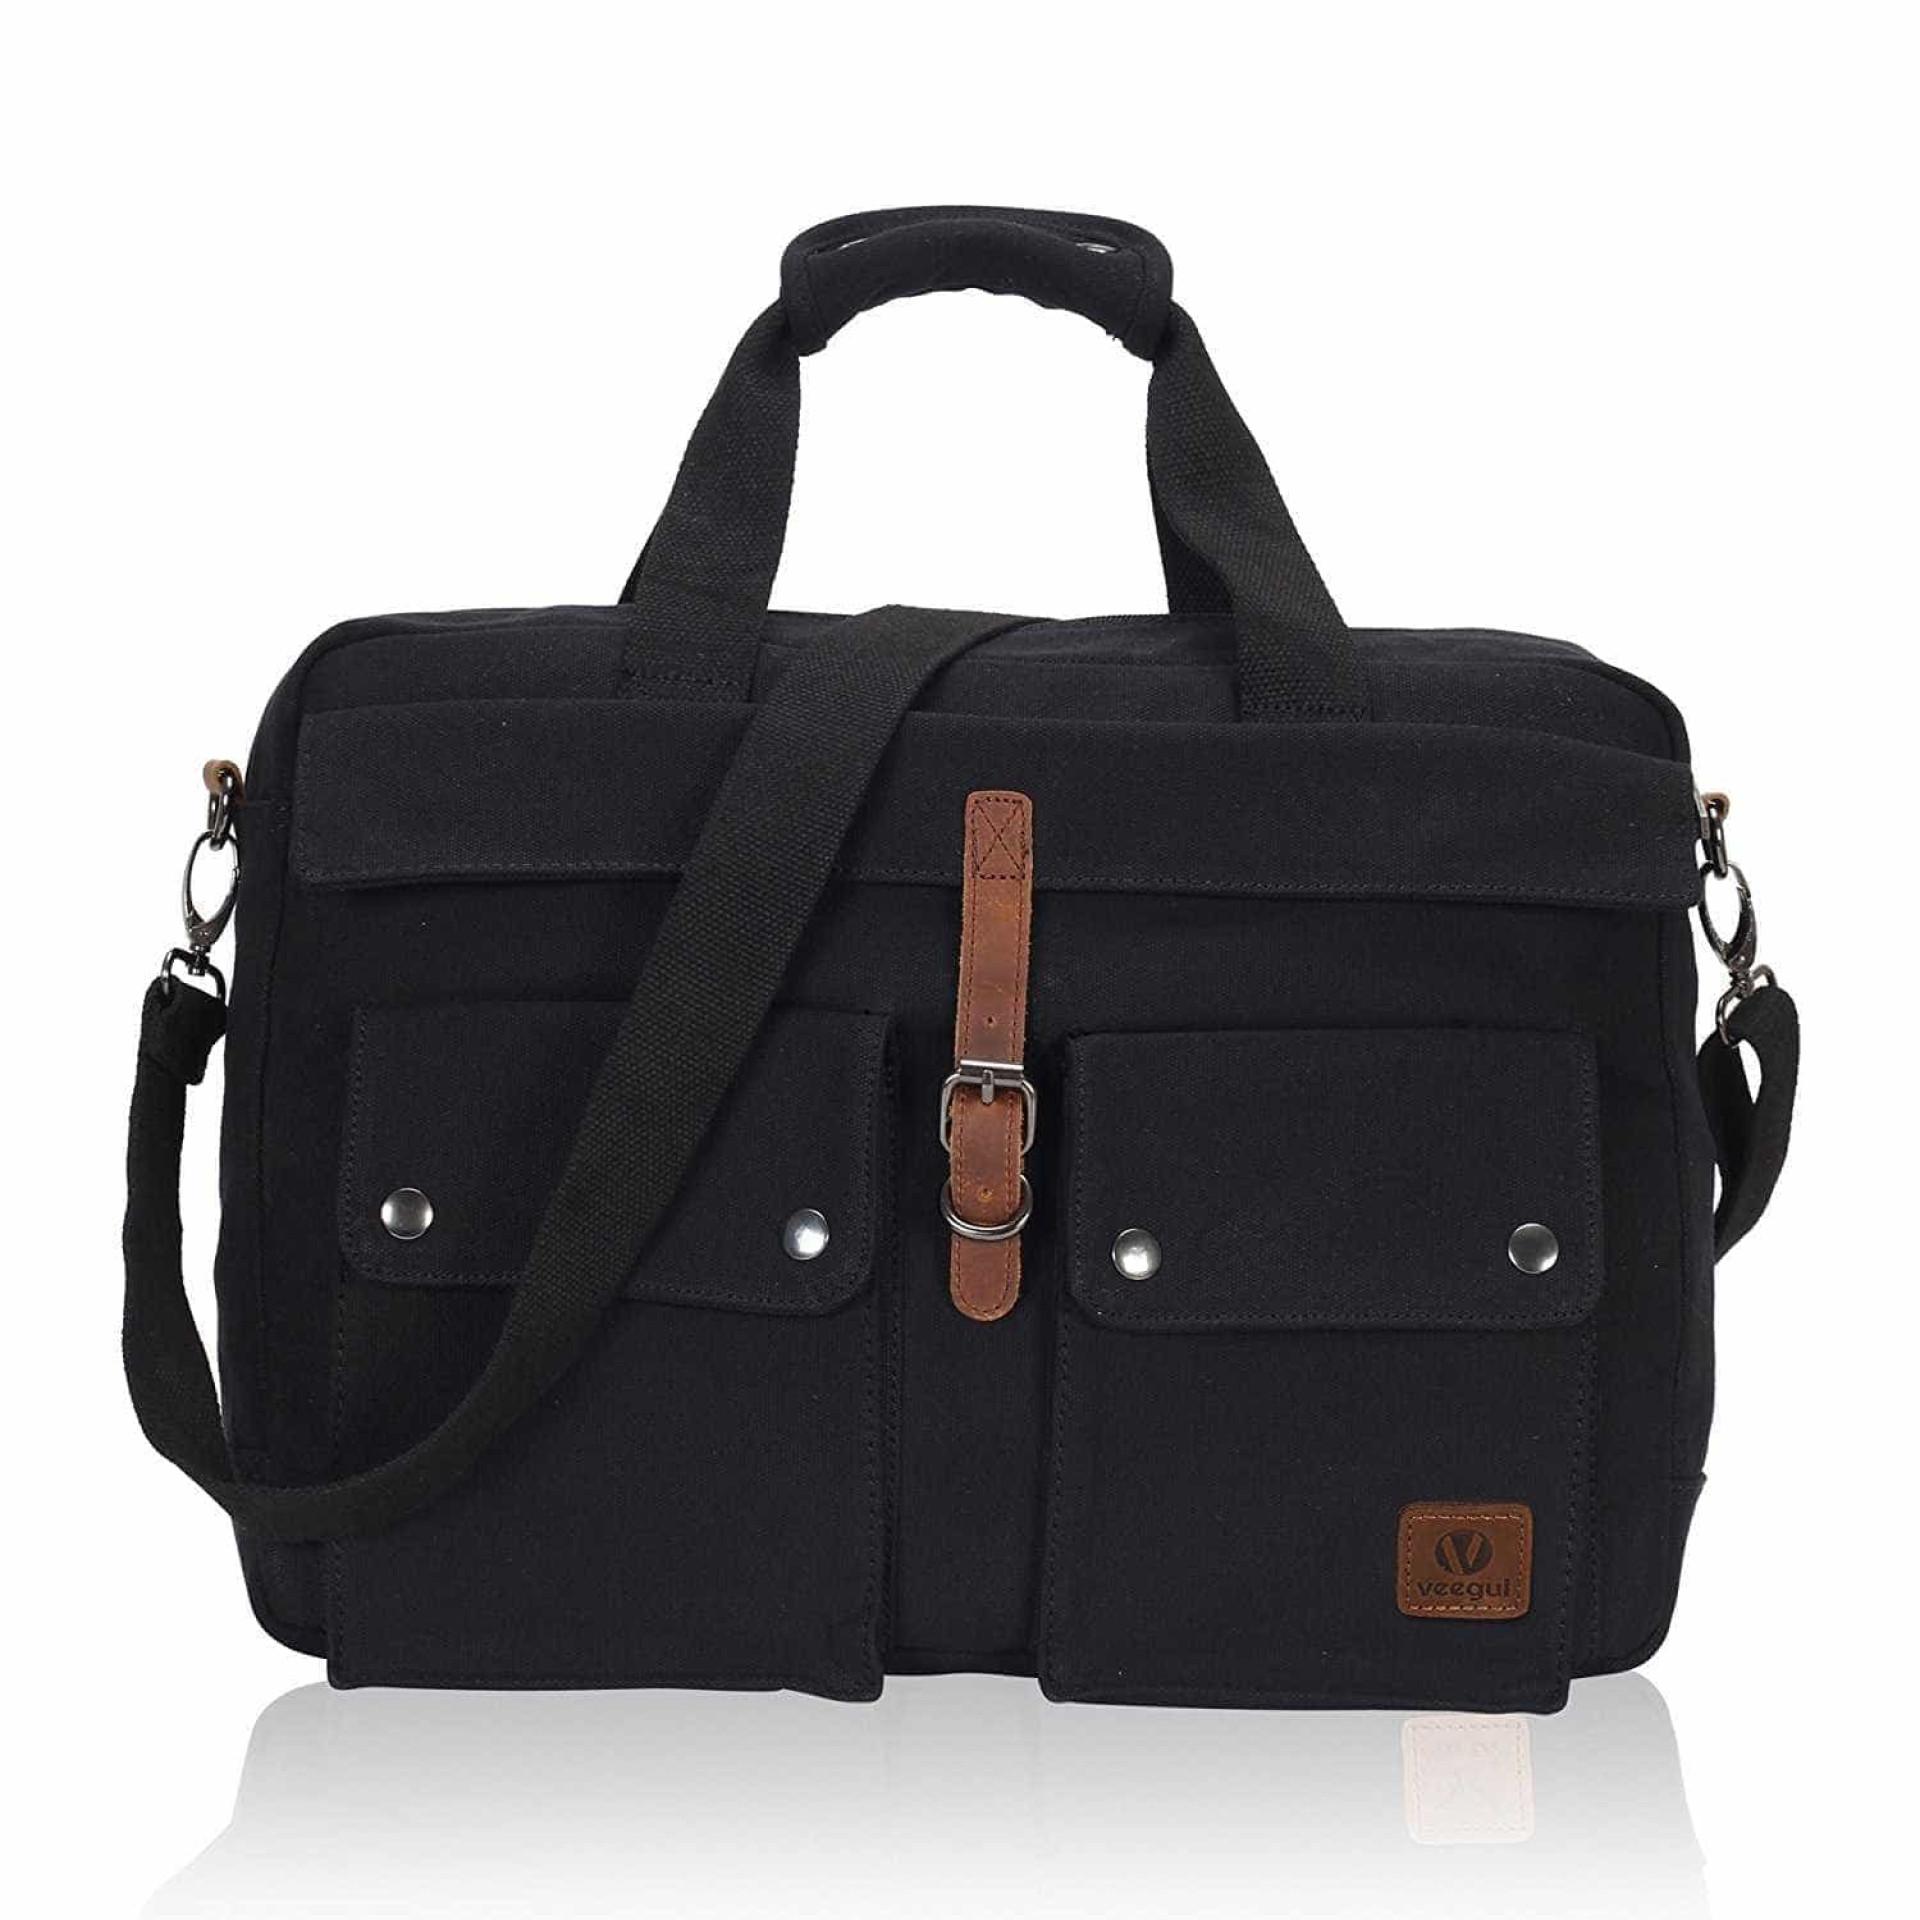 Mens fashion laptop bag 55